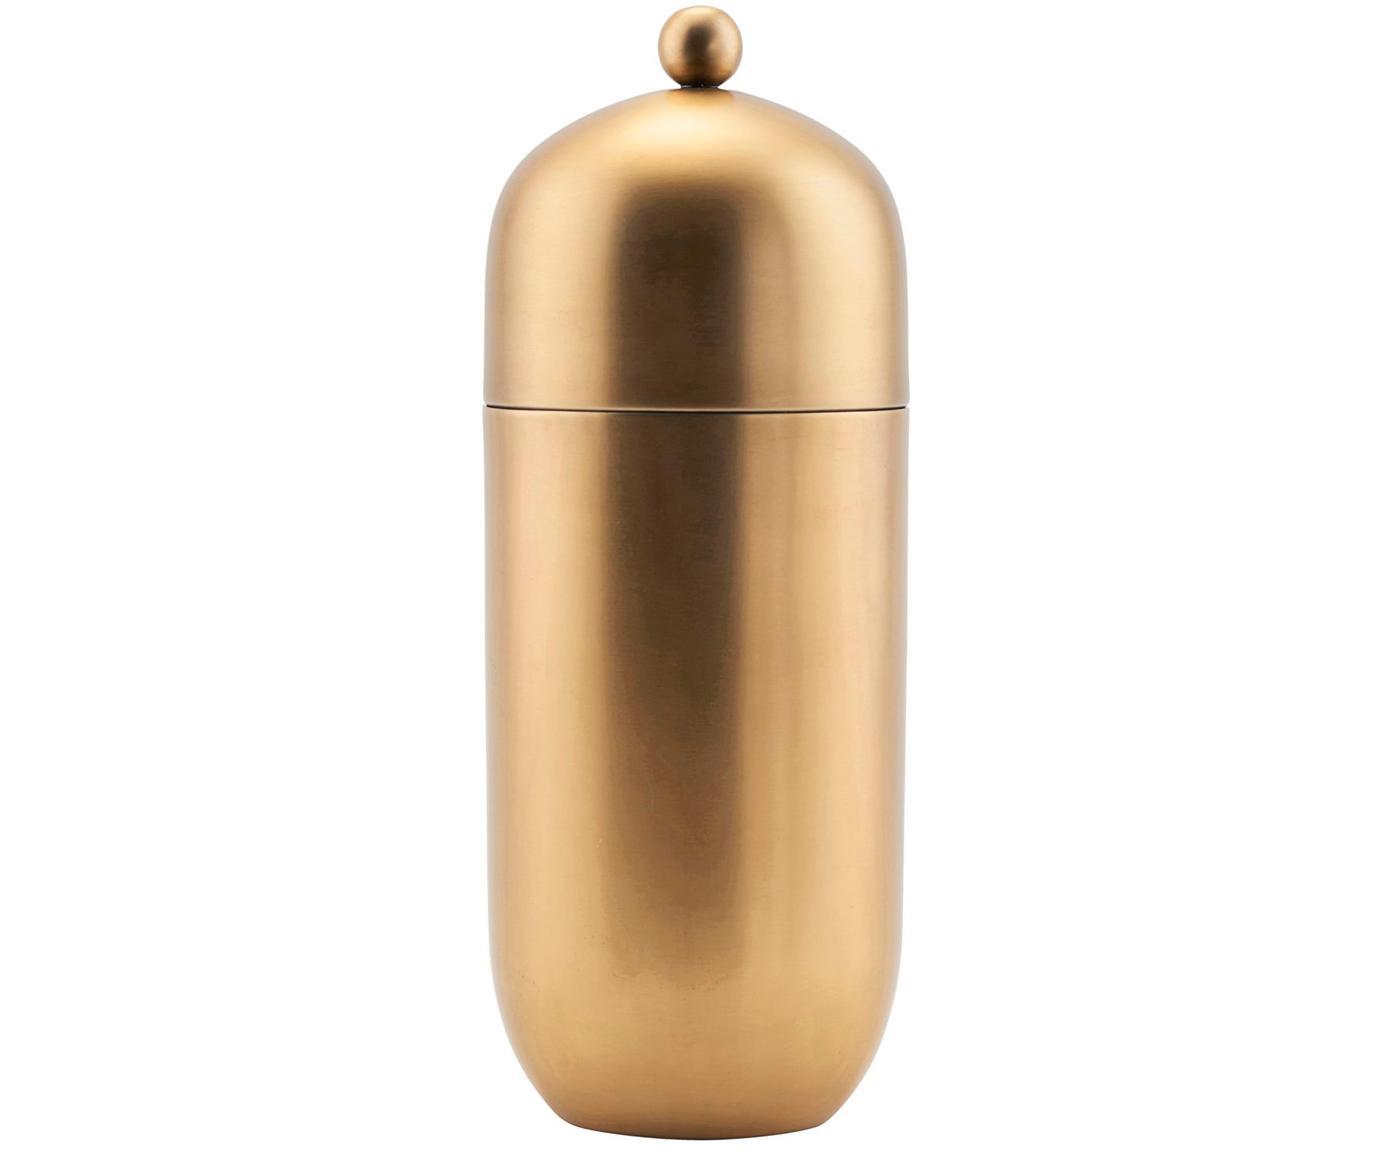 Cocktailshaker Alir in Gold, Edelstahl, Messing, Messingfarben, Ø 9 x H 21 cm